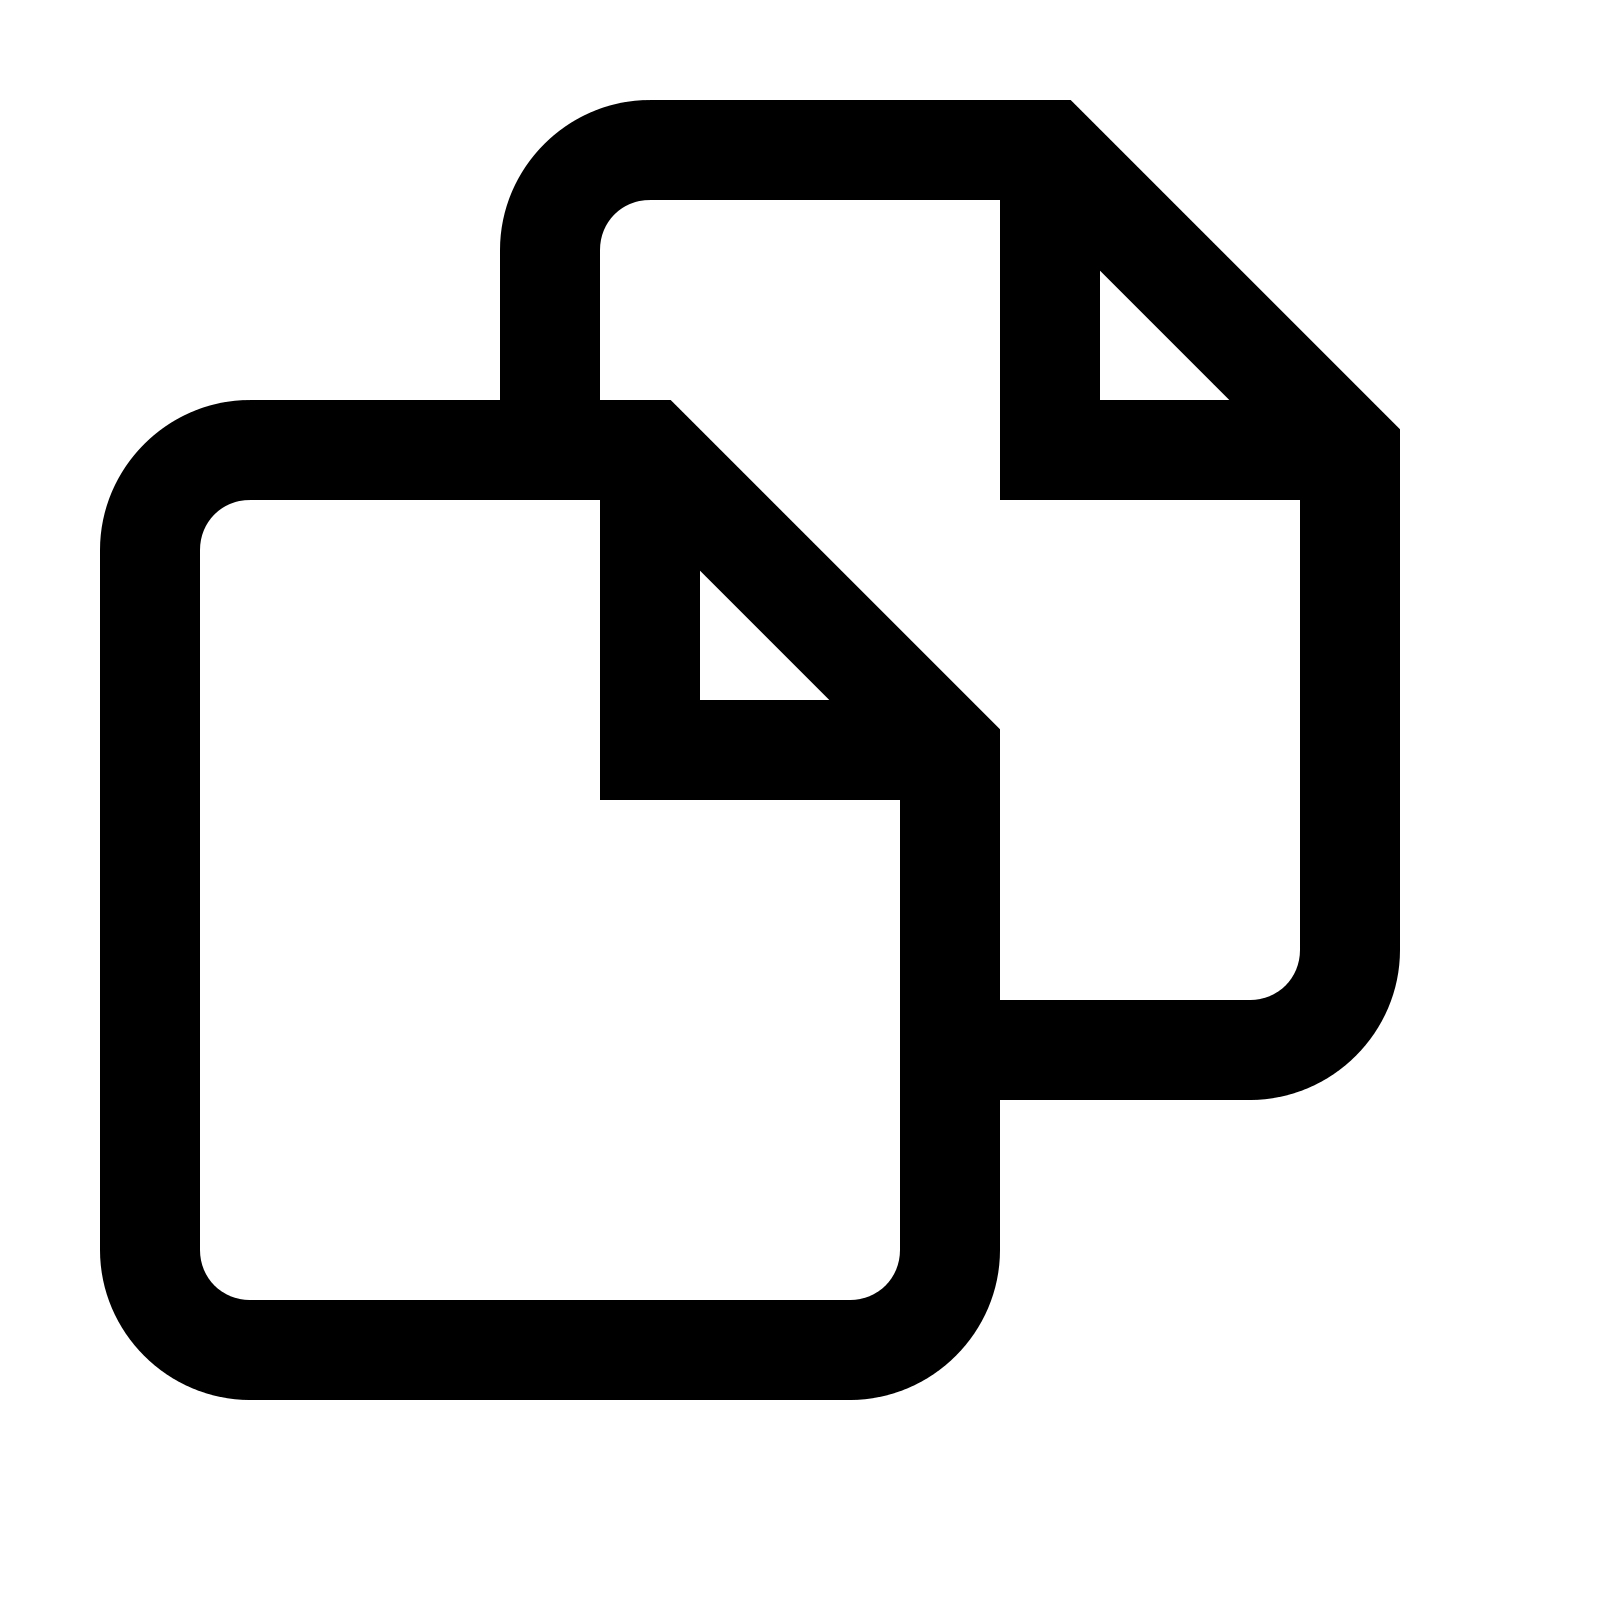 faktury